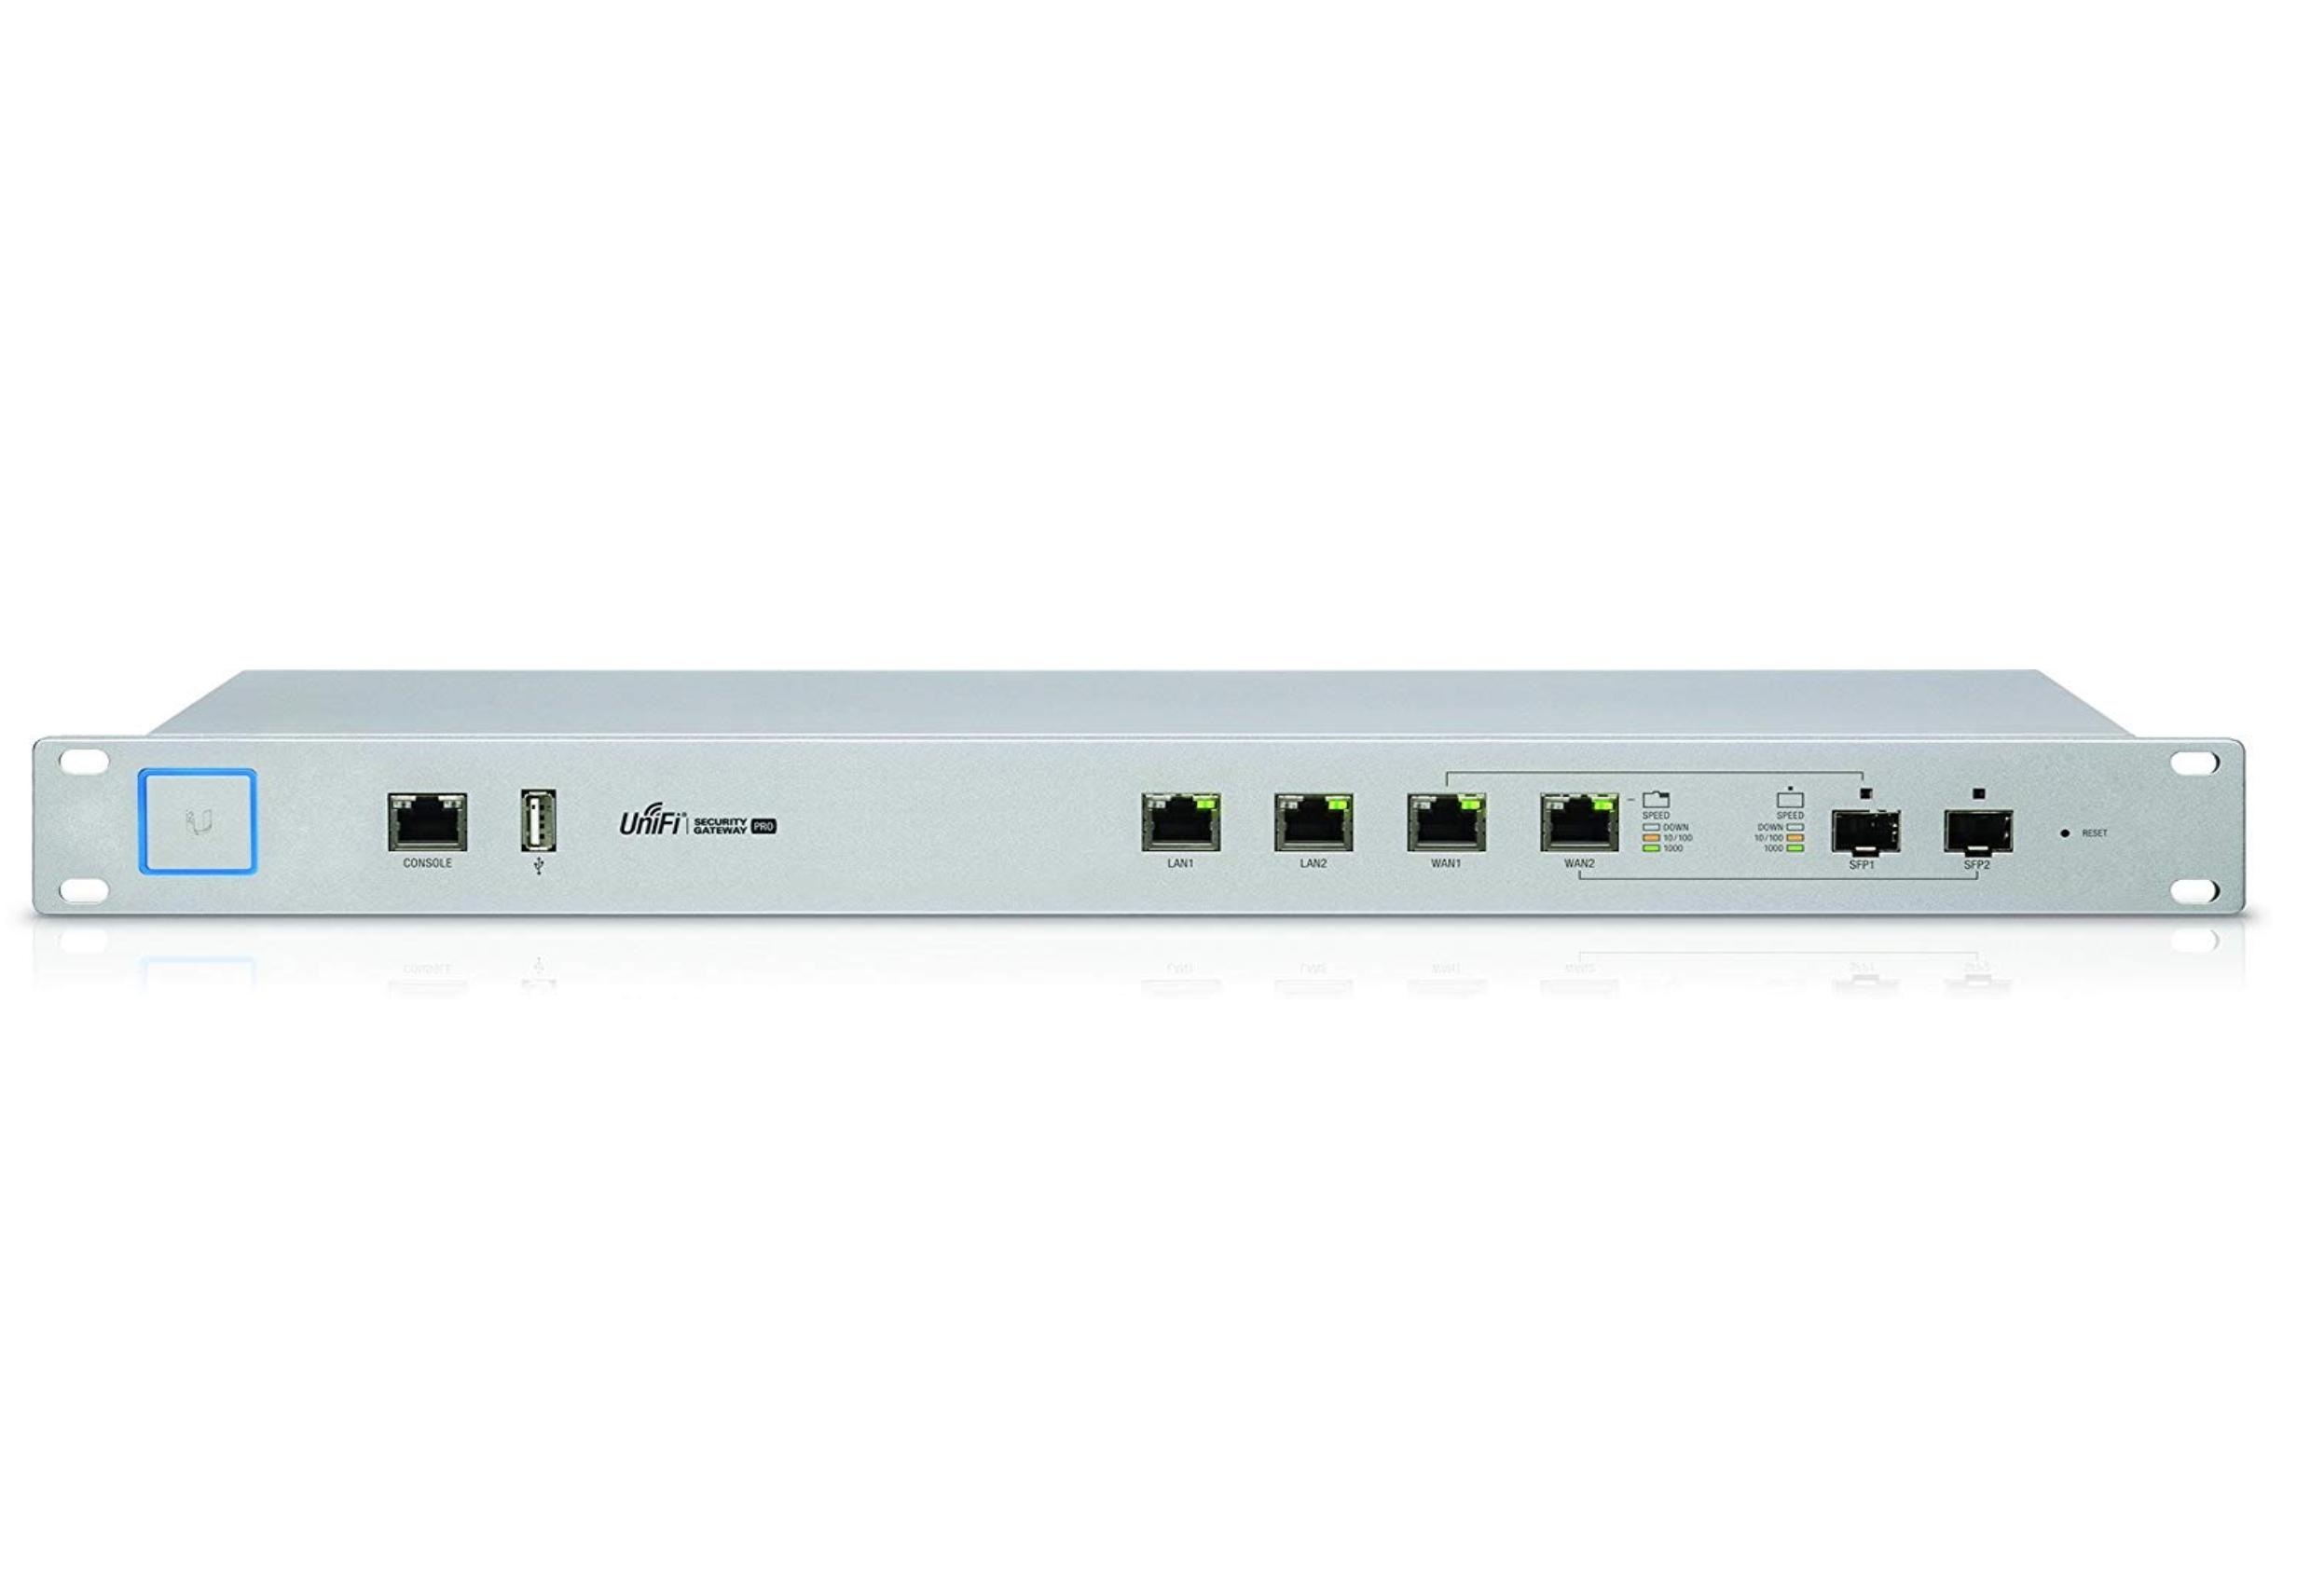 Unifi Security Gateway Pro